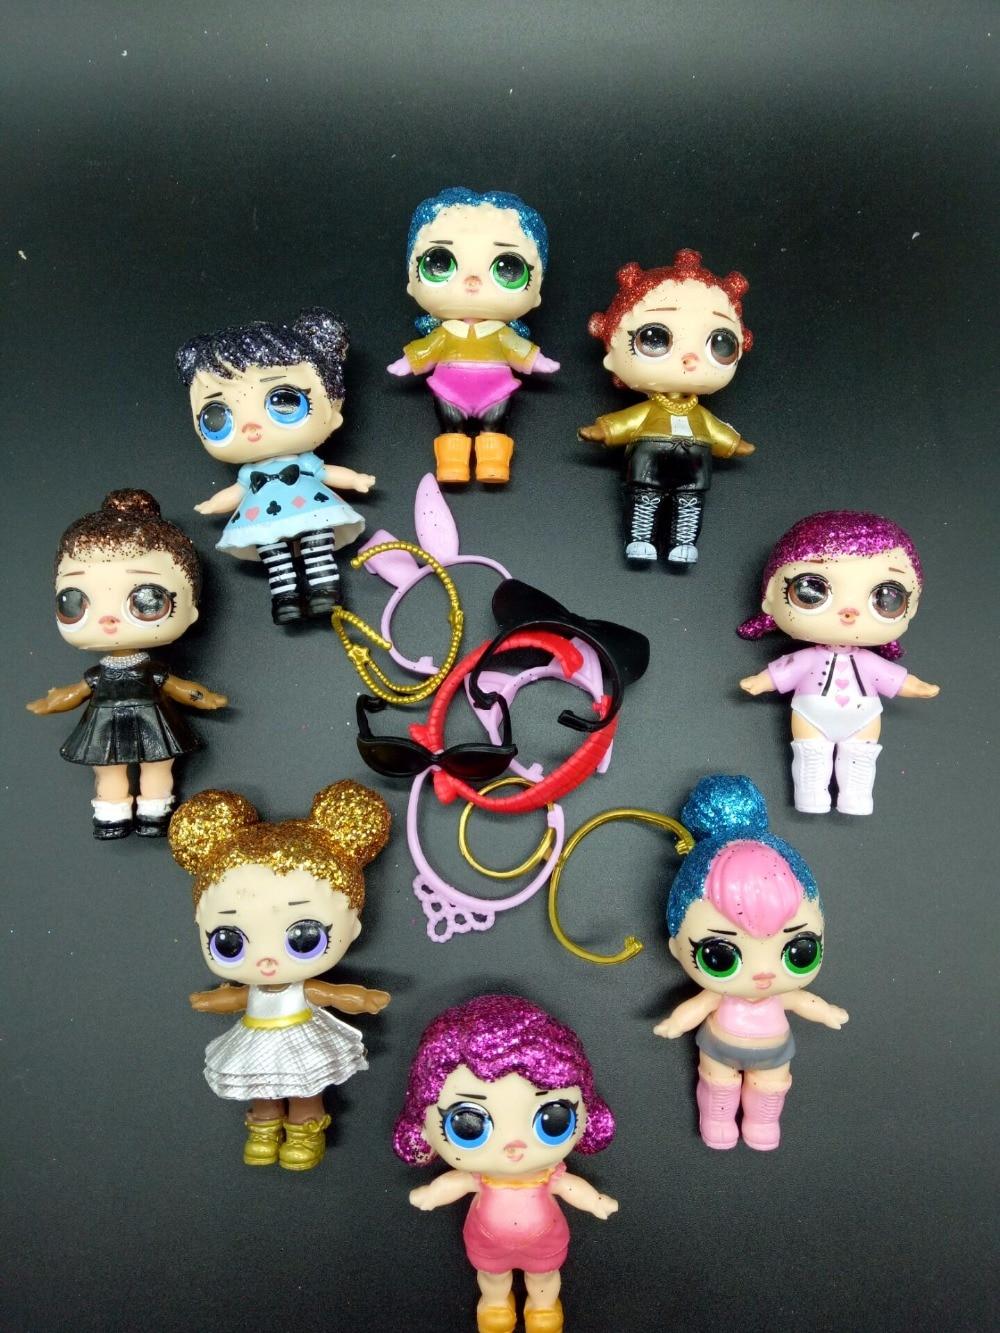 8pcs Shiny hair and many accessories Lol Lol doll toys